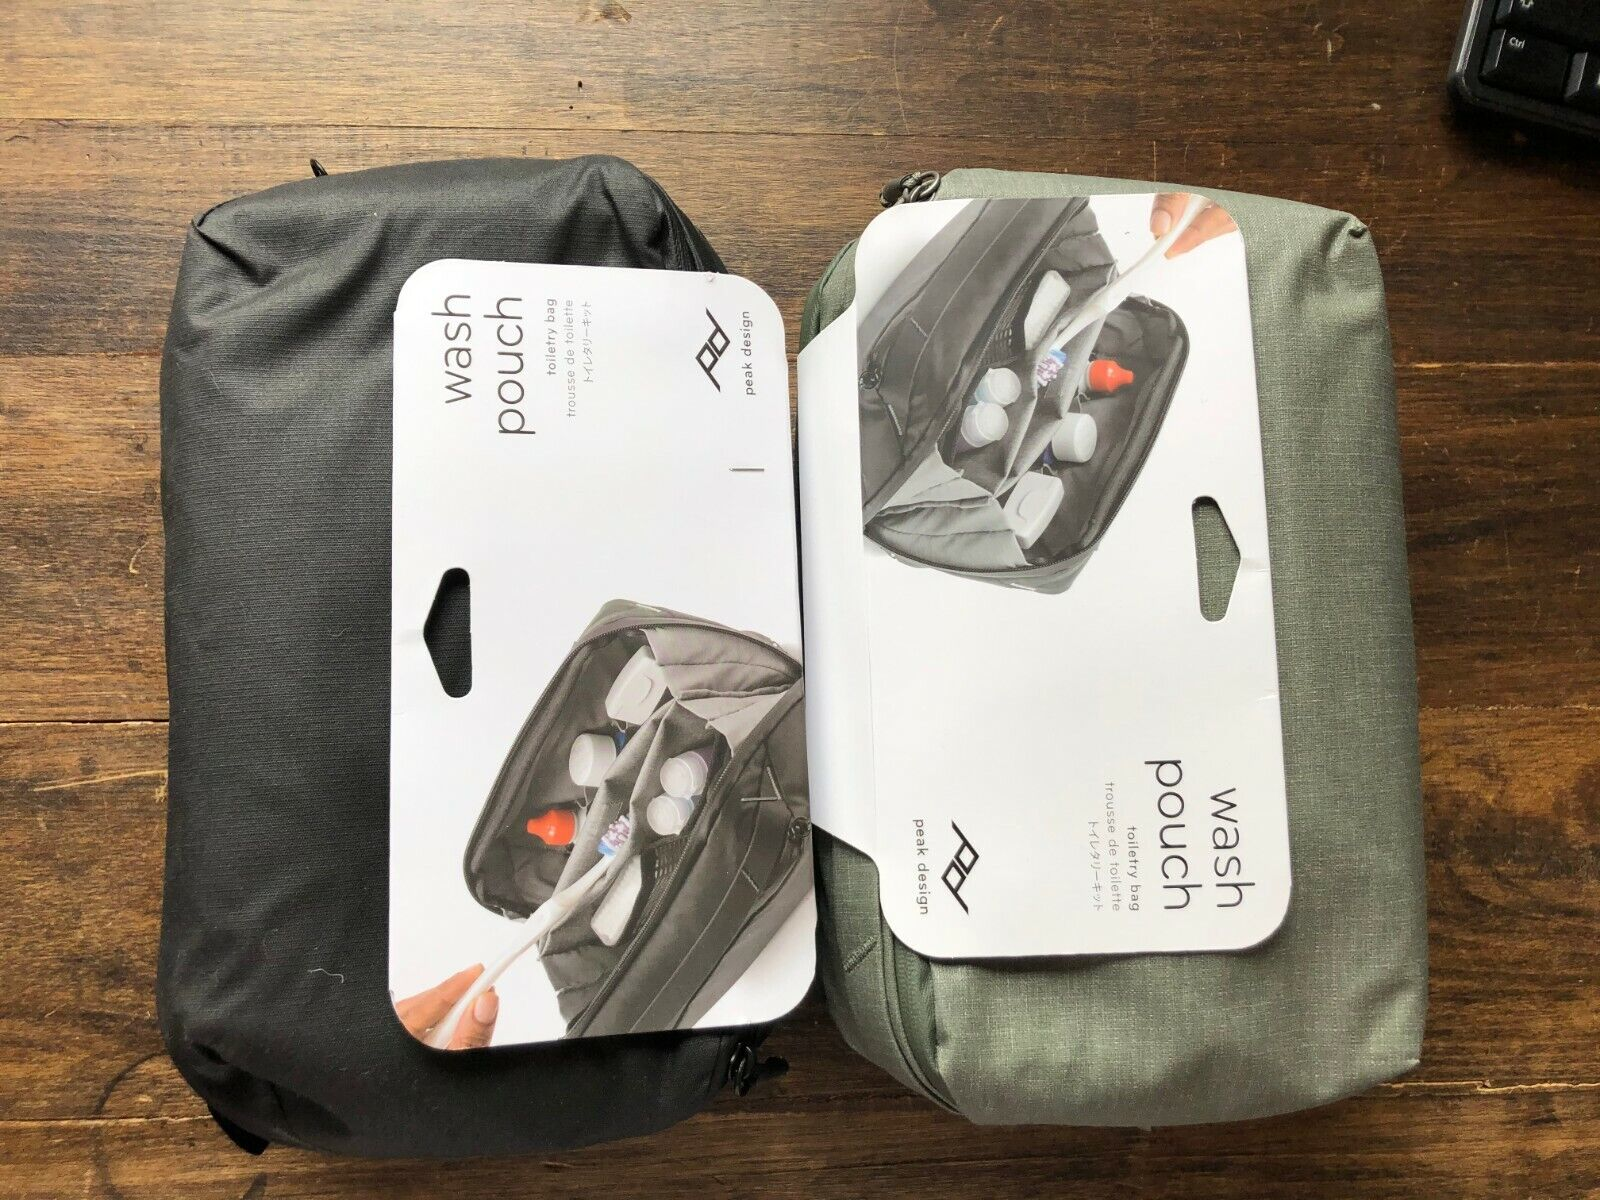 Peak Design Wash Pouch Dopp Kit Ditty Bag Toiletry Bag - $85.00